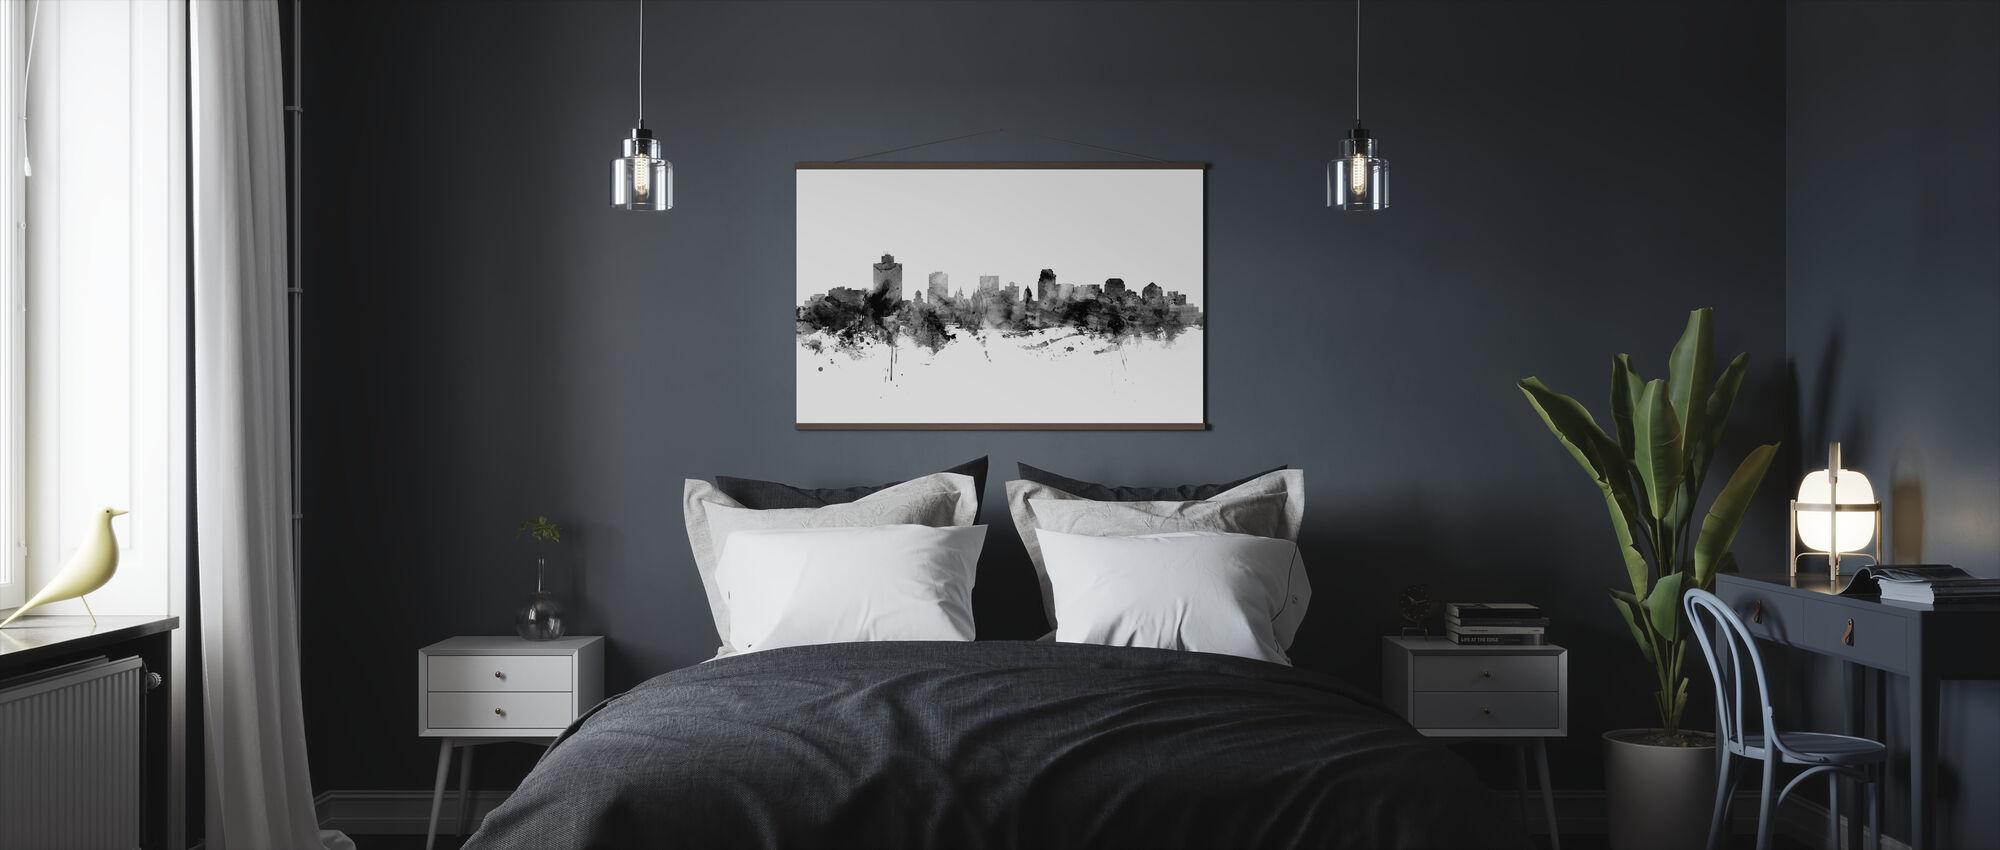 Salt Lake City Skyline, zwart-wit - Poster - Slaapkamer